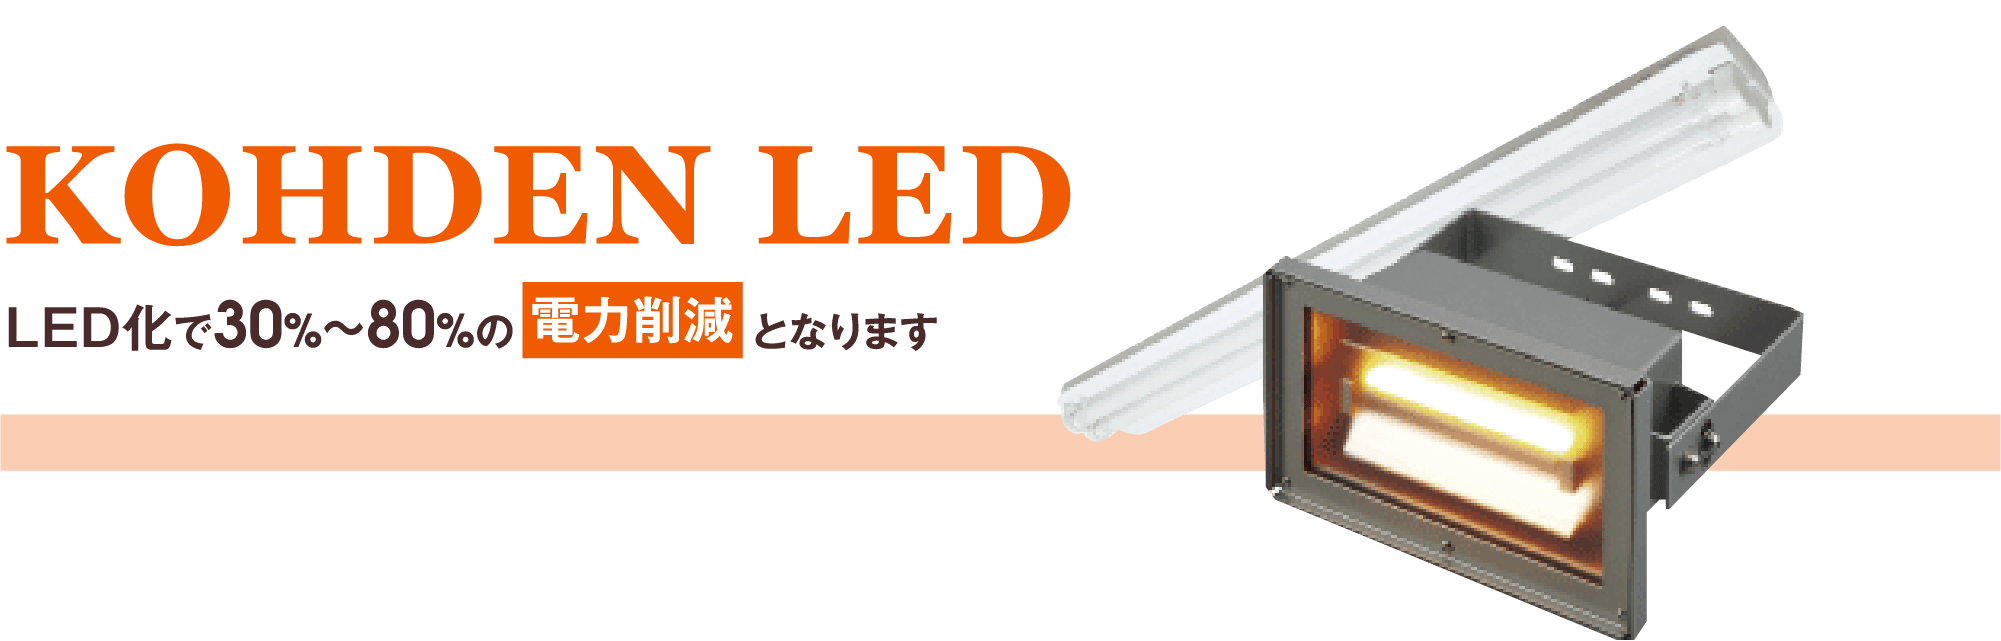 KOHDEN LED化で30%~80%の 電力削減 となります